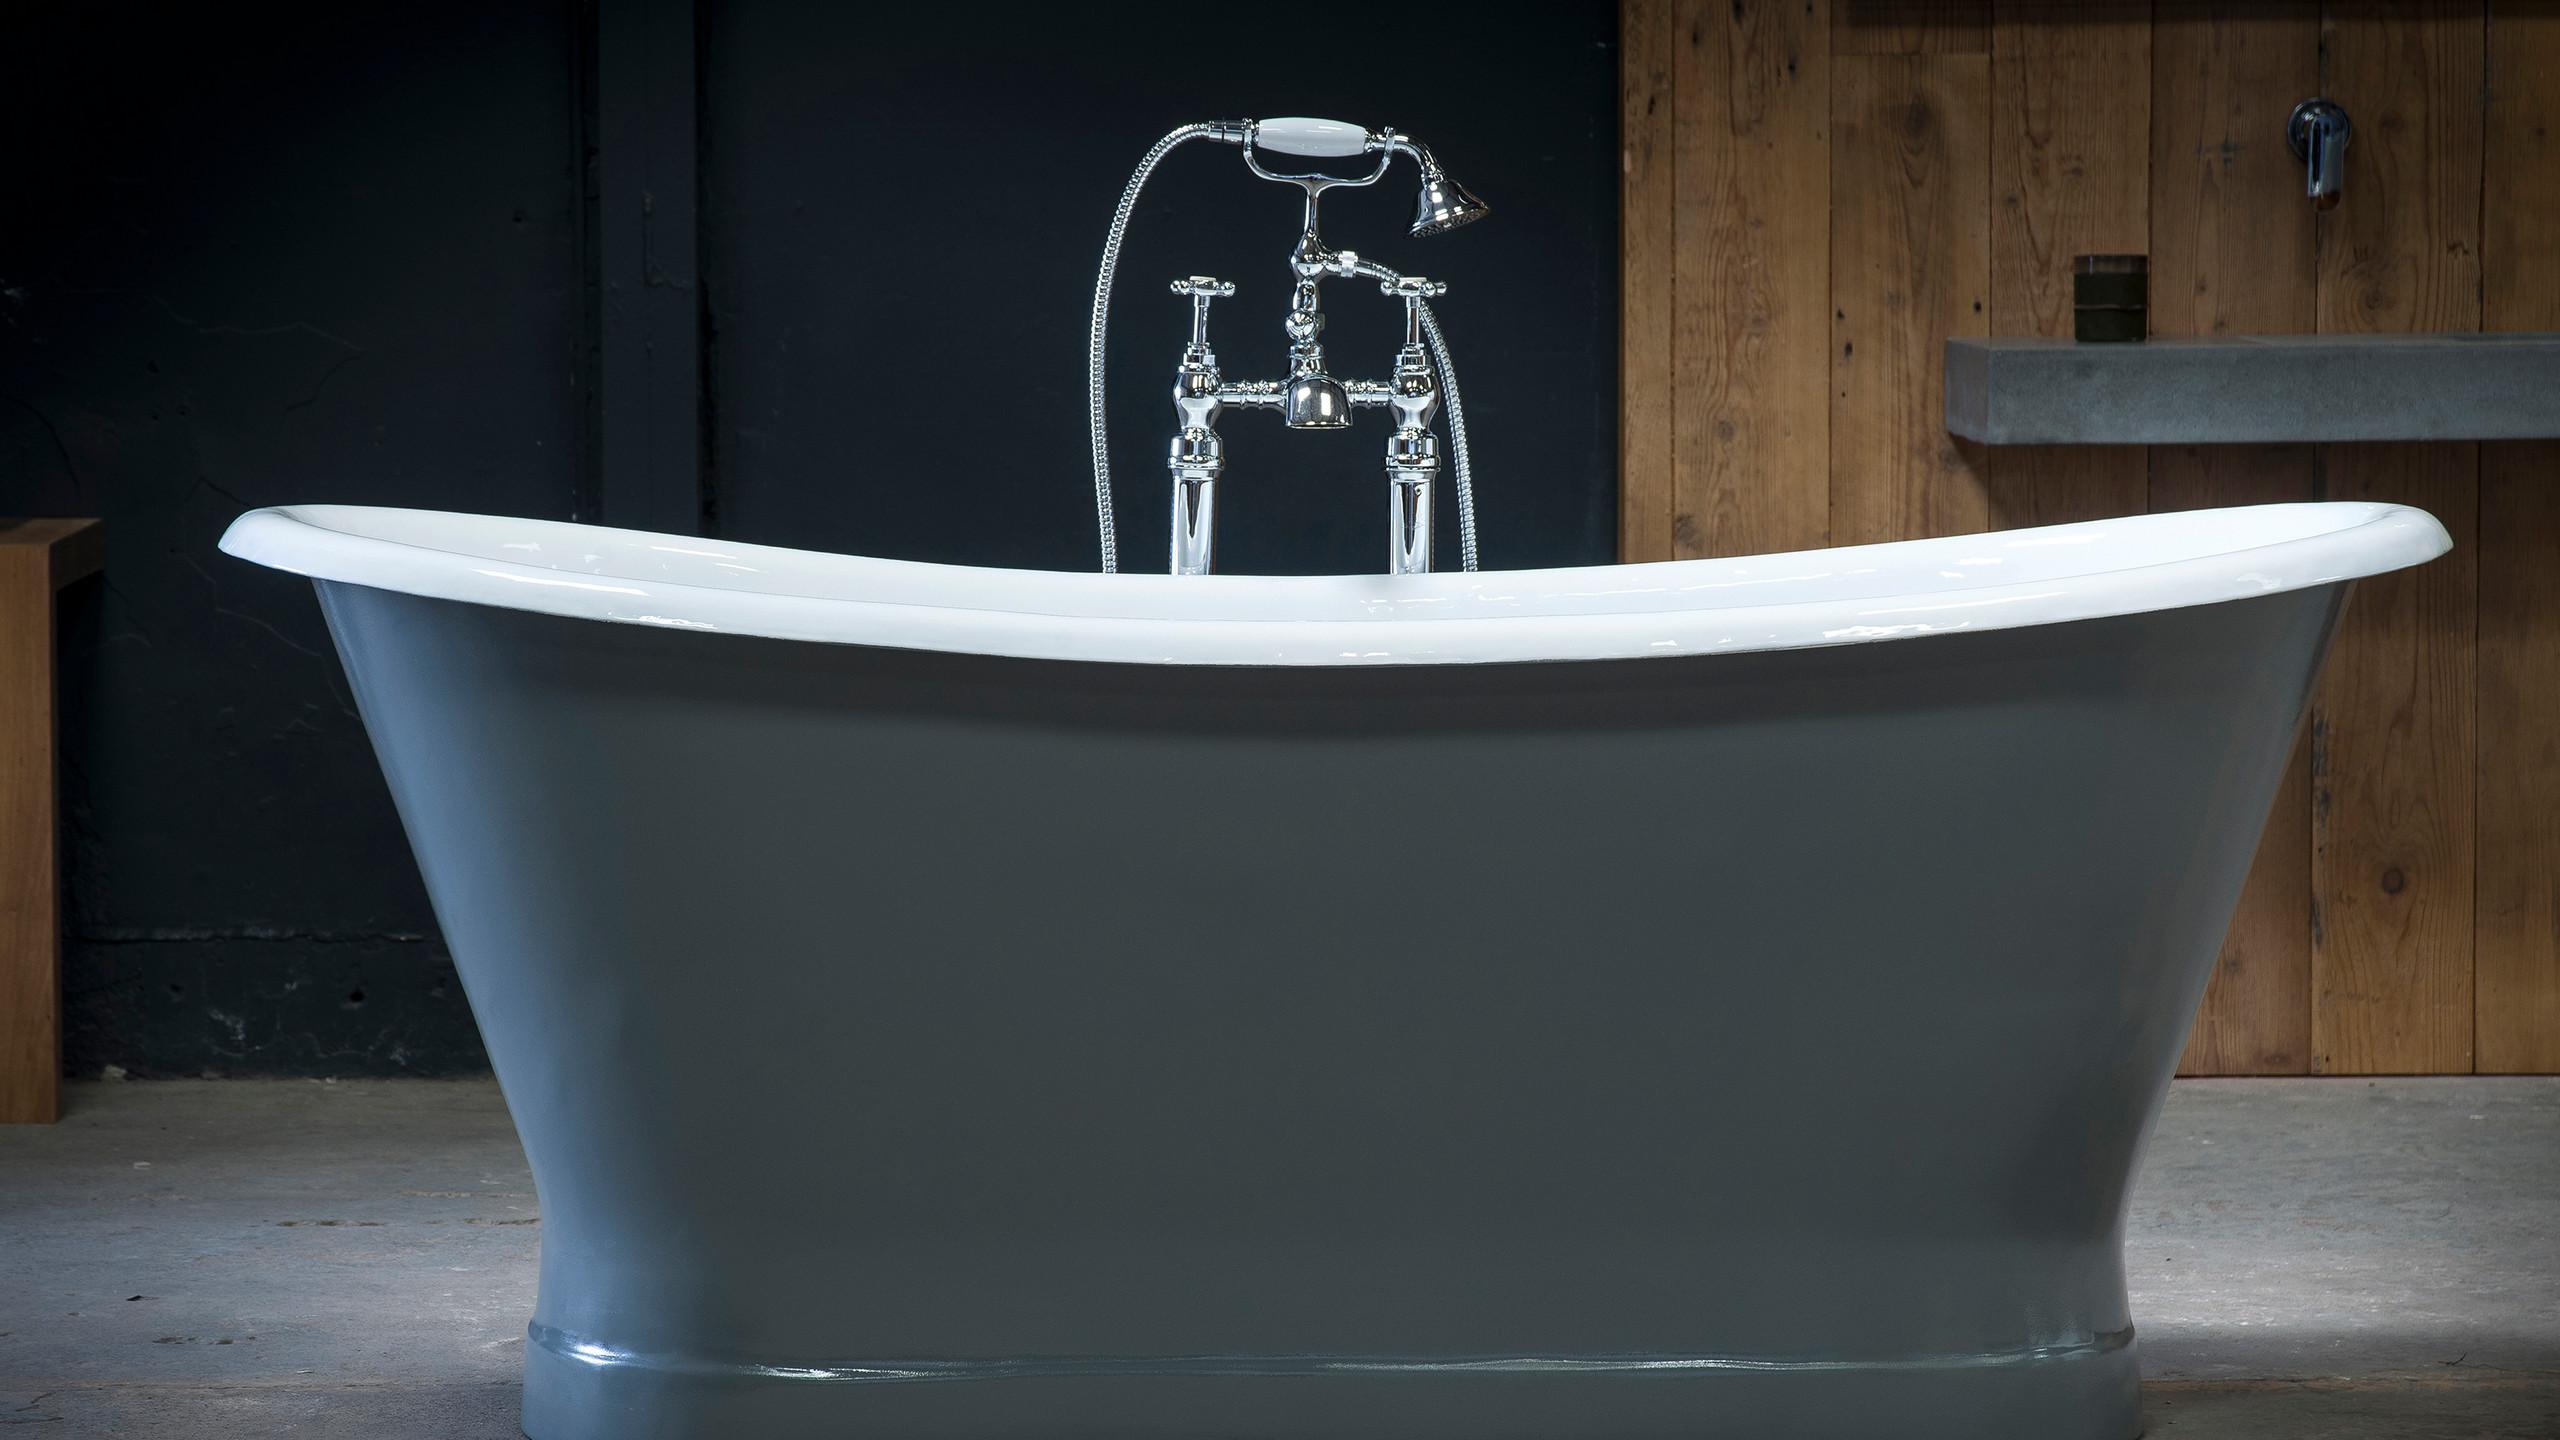 Arroll The Lyon Cast Iron Bath now available at Foundry Cast Iron!